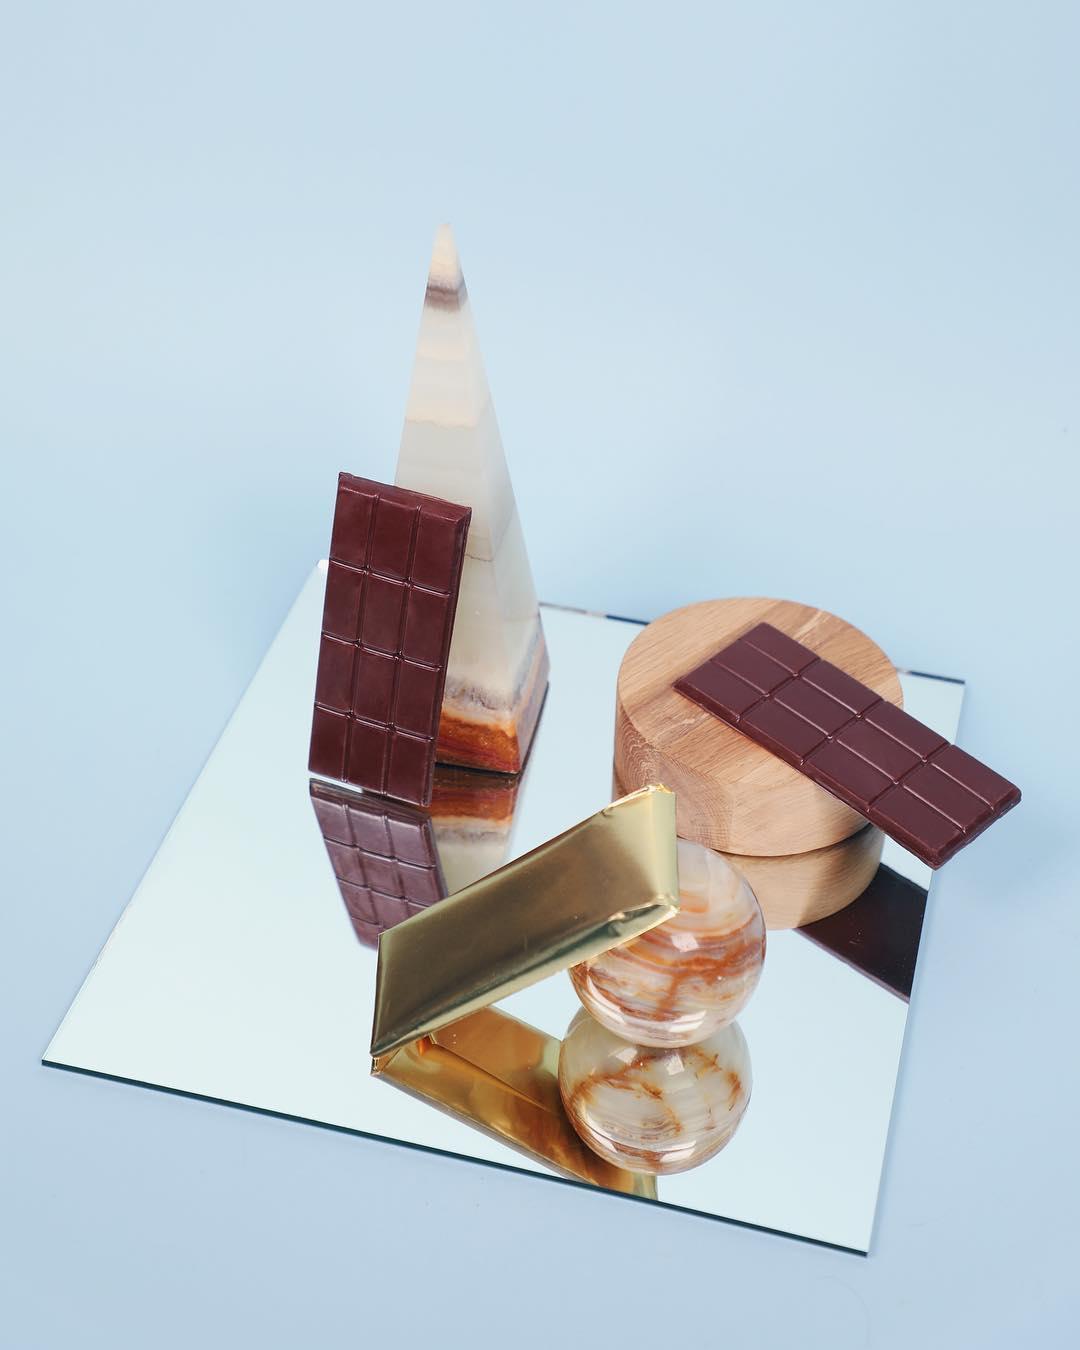 Claggie 75% Dark Chocolate Bar,  $10